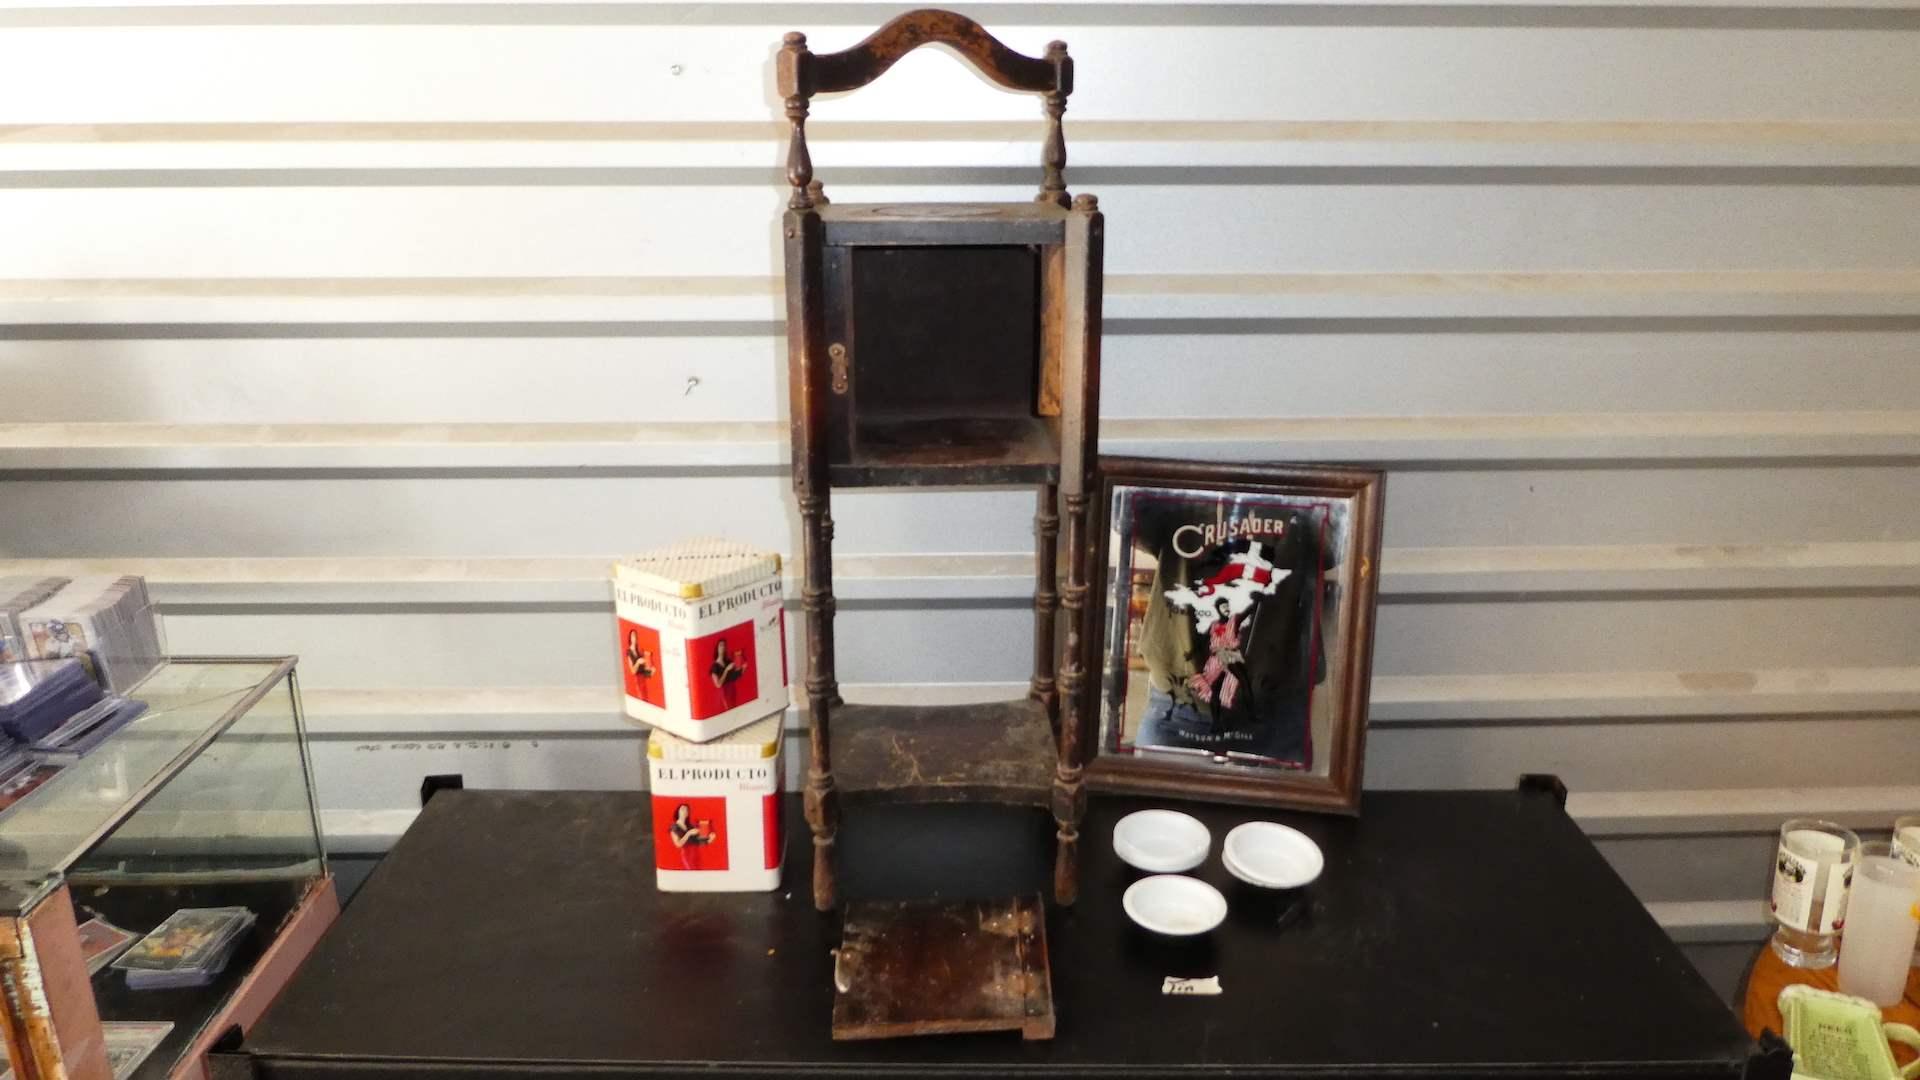 Lot # 313 - Antique Cigar Table w/ Vintage Crusaders Tobacco Mirror and El Producto Blunts Tins (main image)